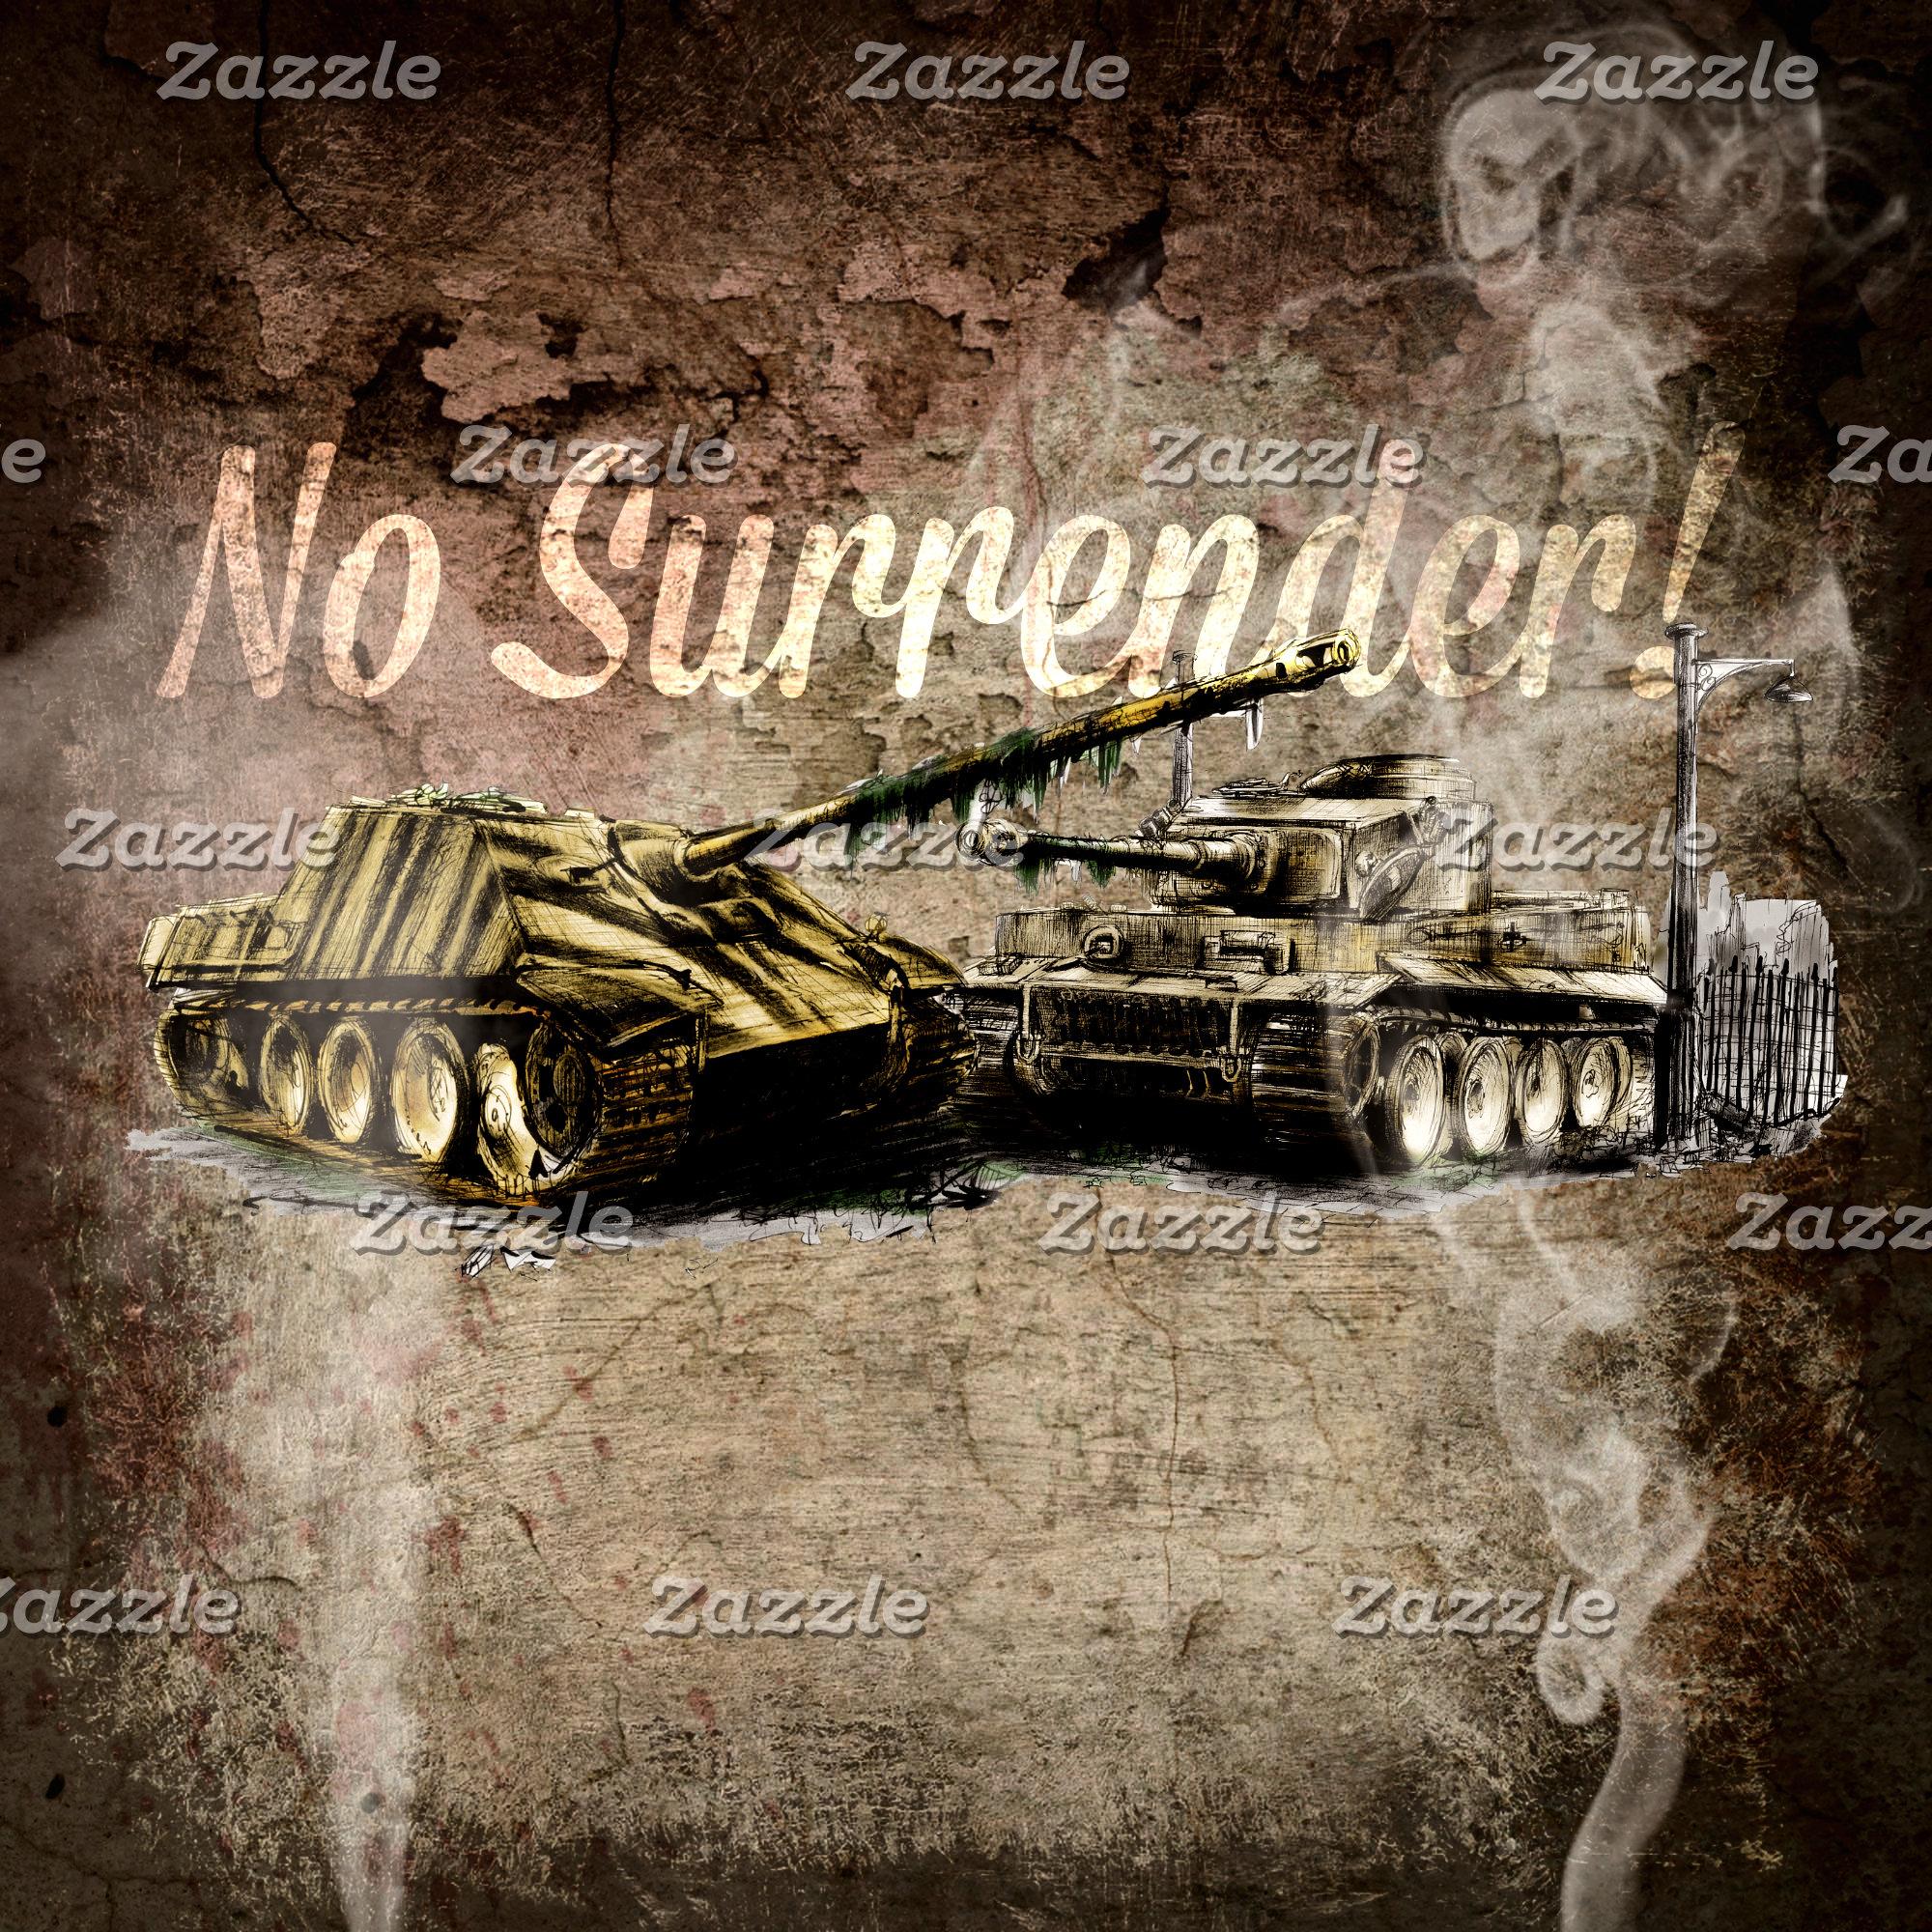 Tiger and Jagdpanther, WW2 German Panzers